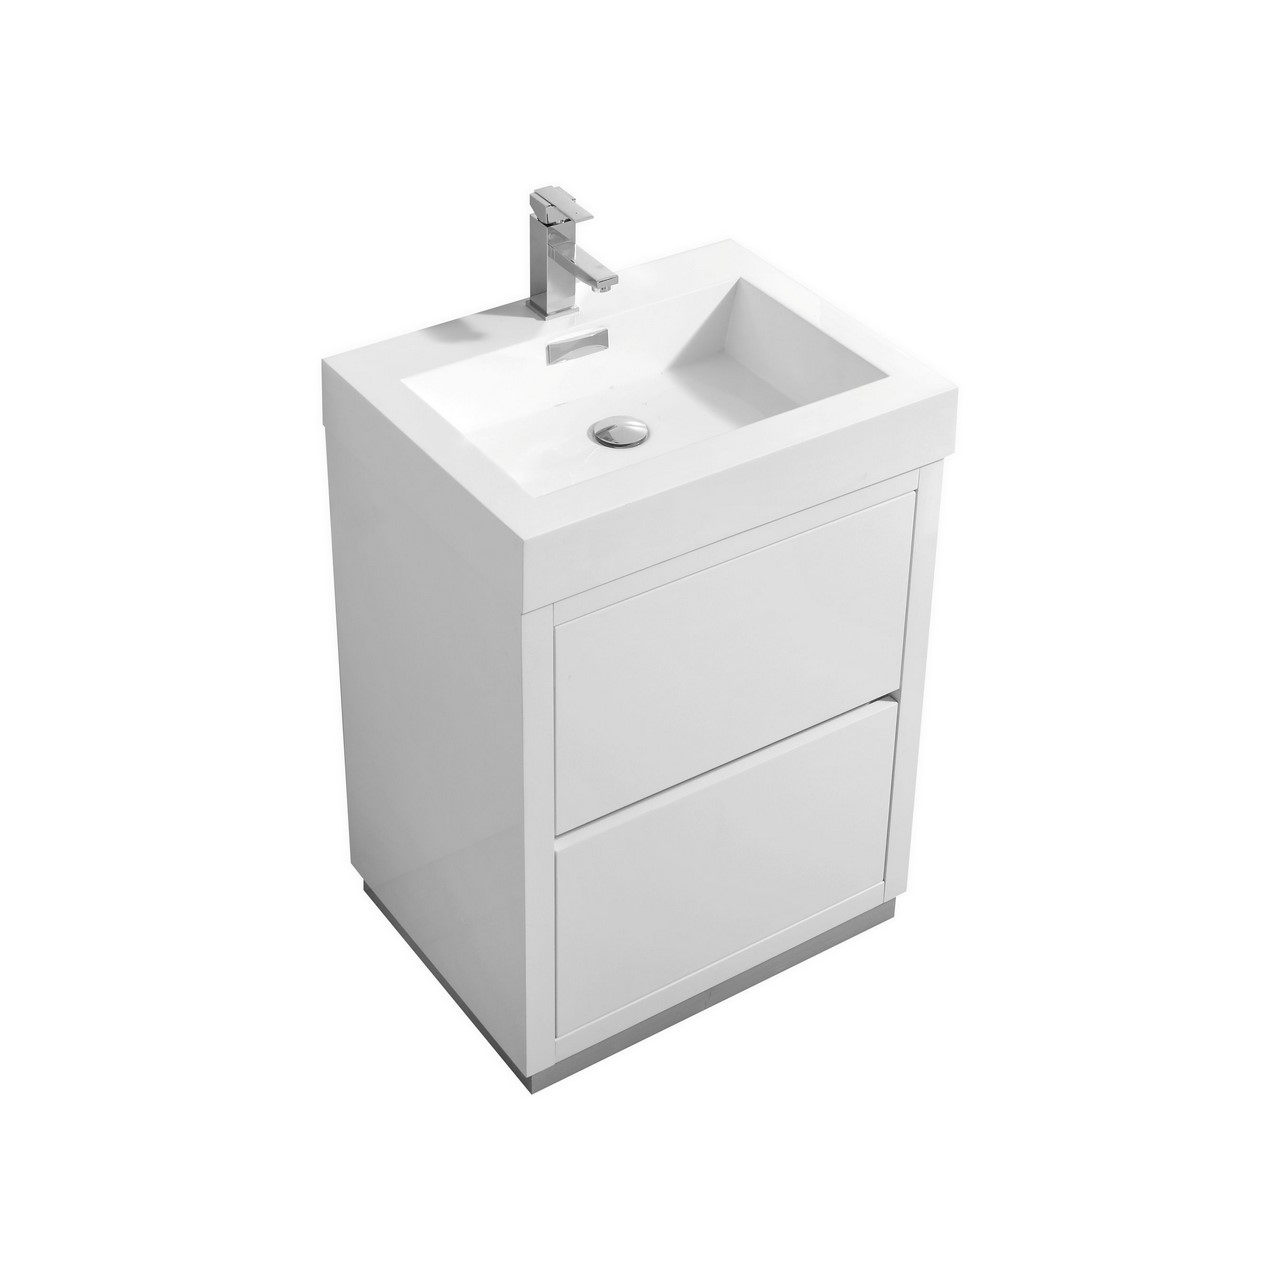 "Modern Lux 24"" High Gloss White Free Standing Modern Bathroom Vanity"